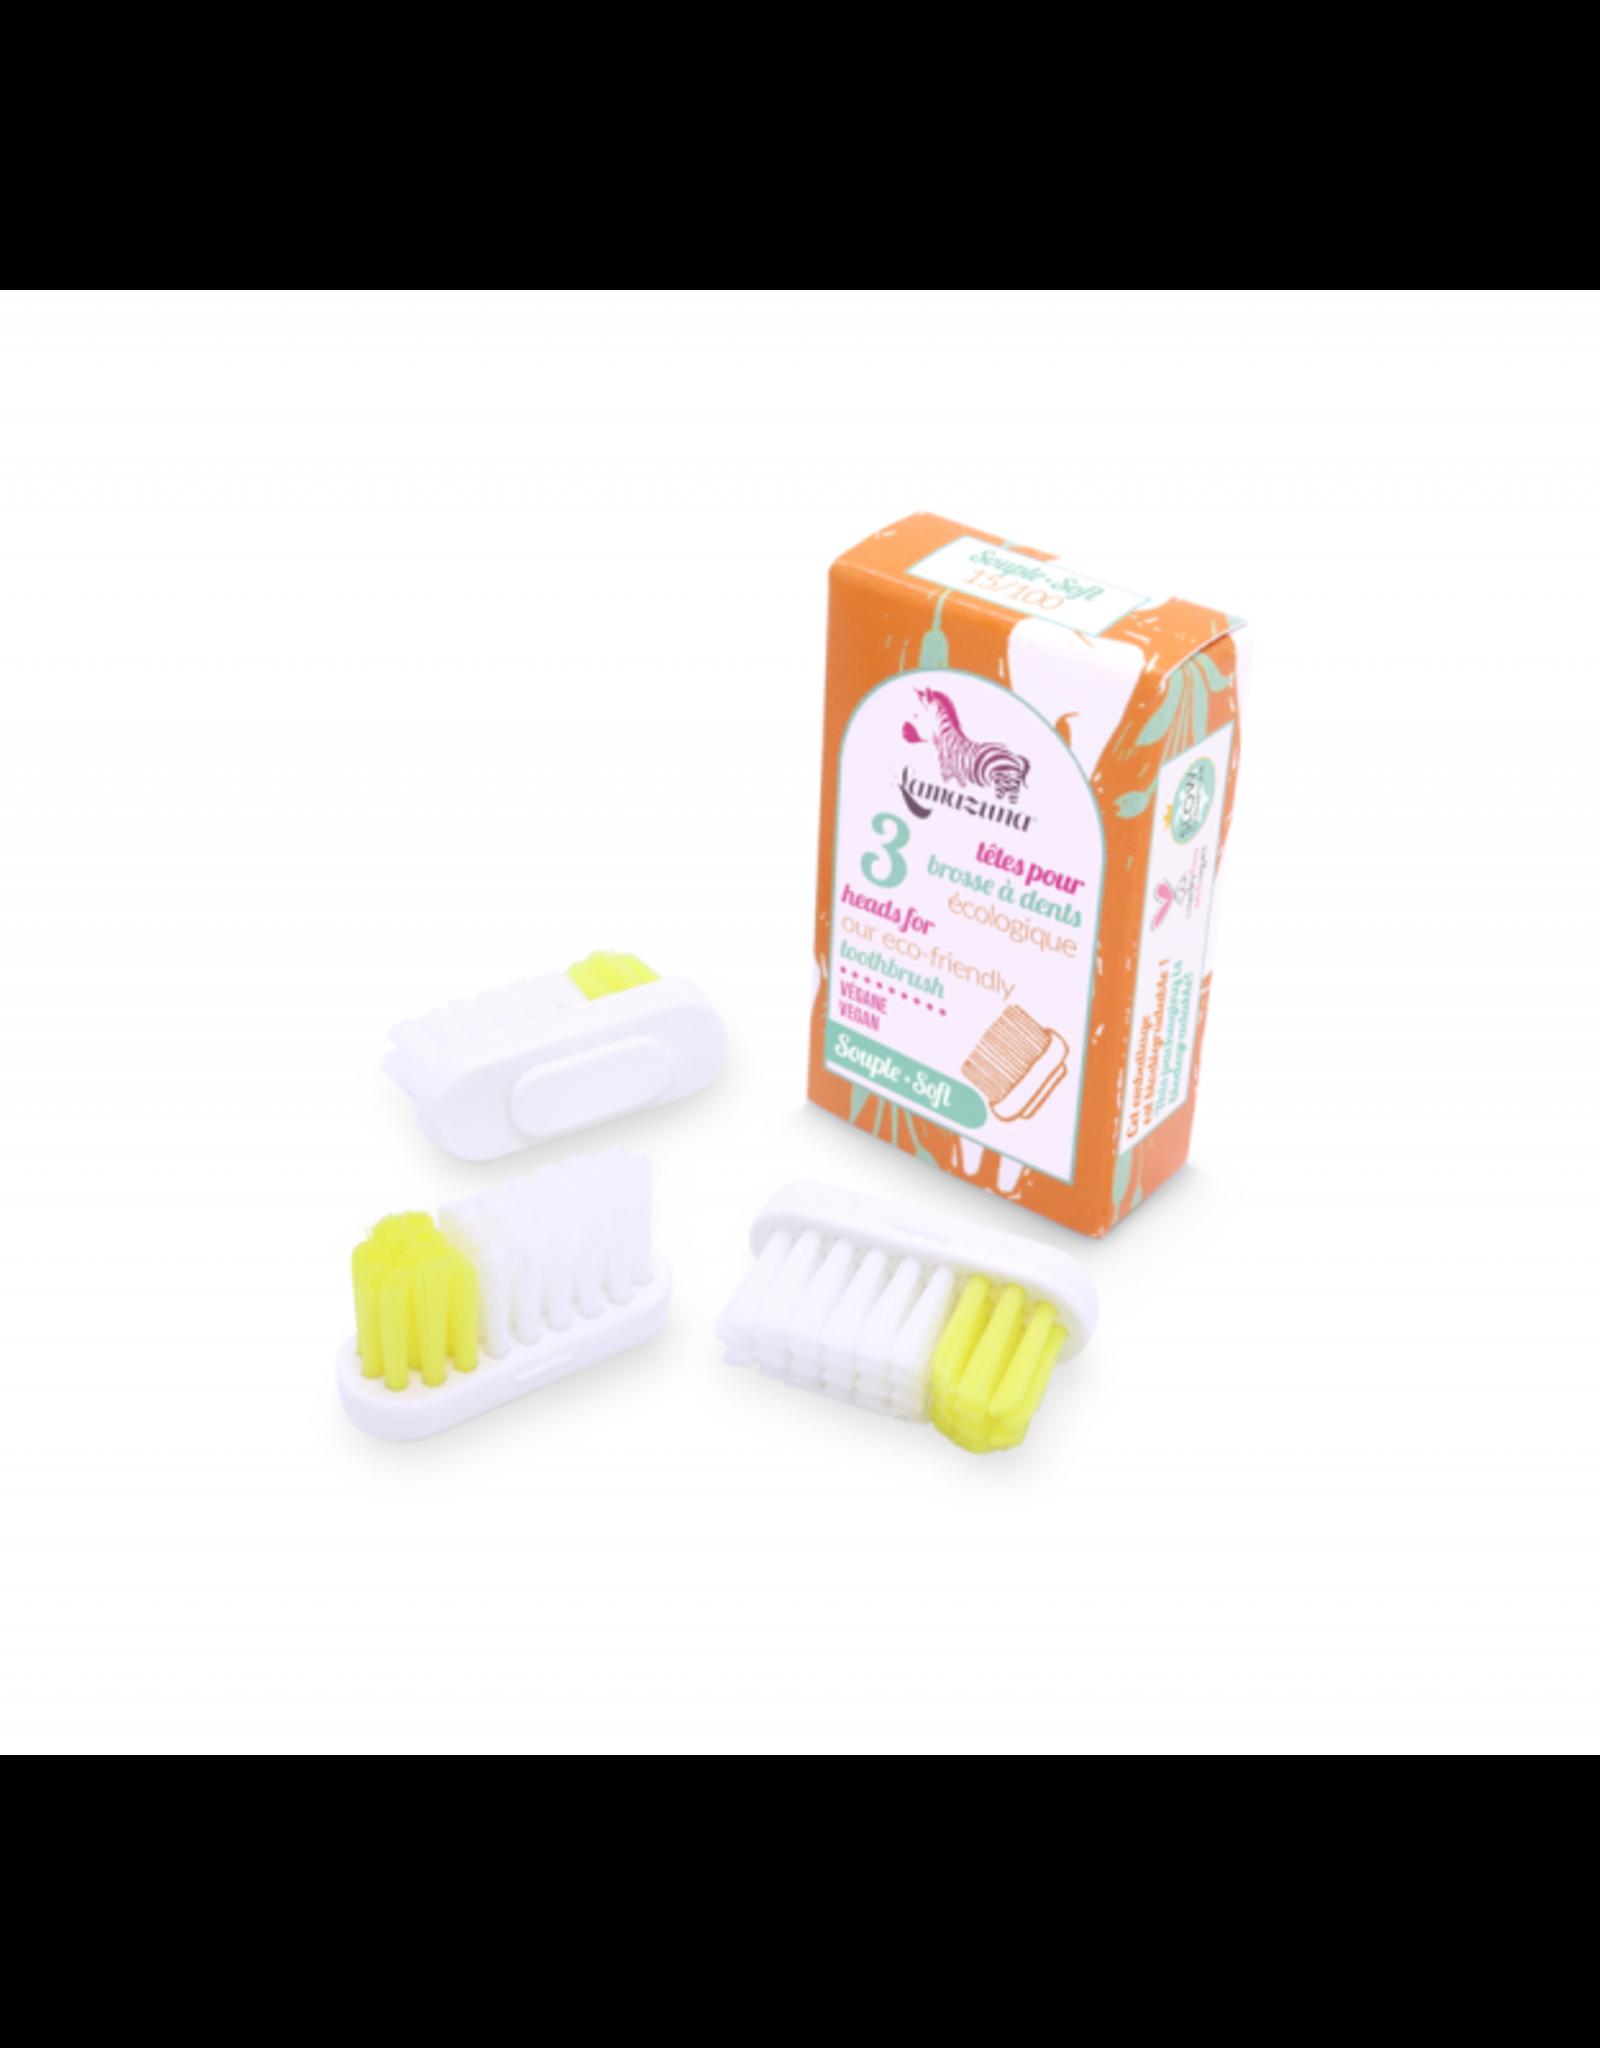 Lamazuna borsteltjes voor Tandenborstelhouder Zacht - 3 stuks